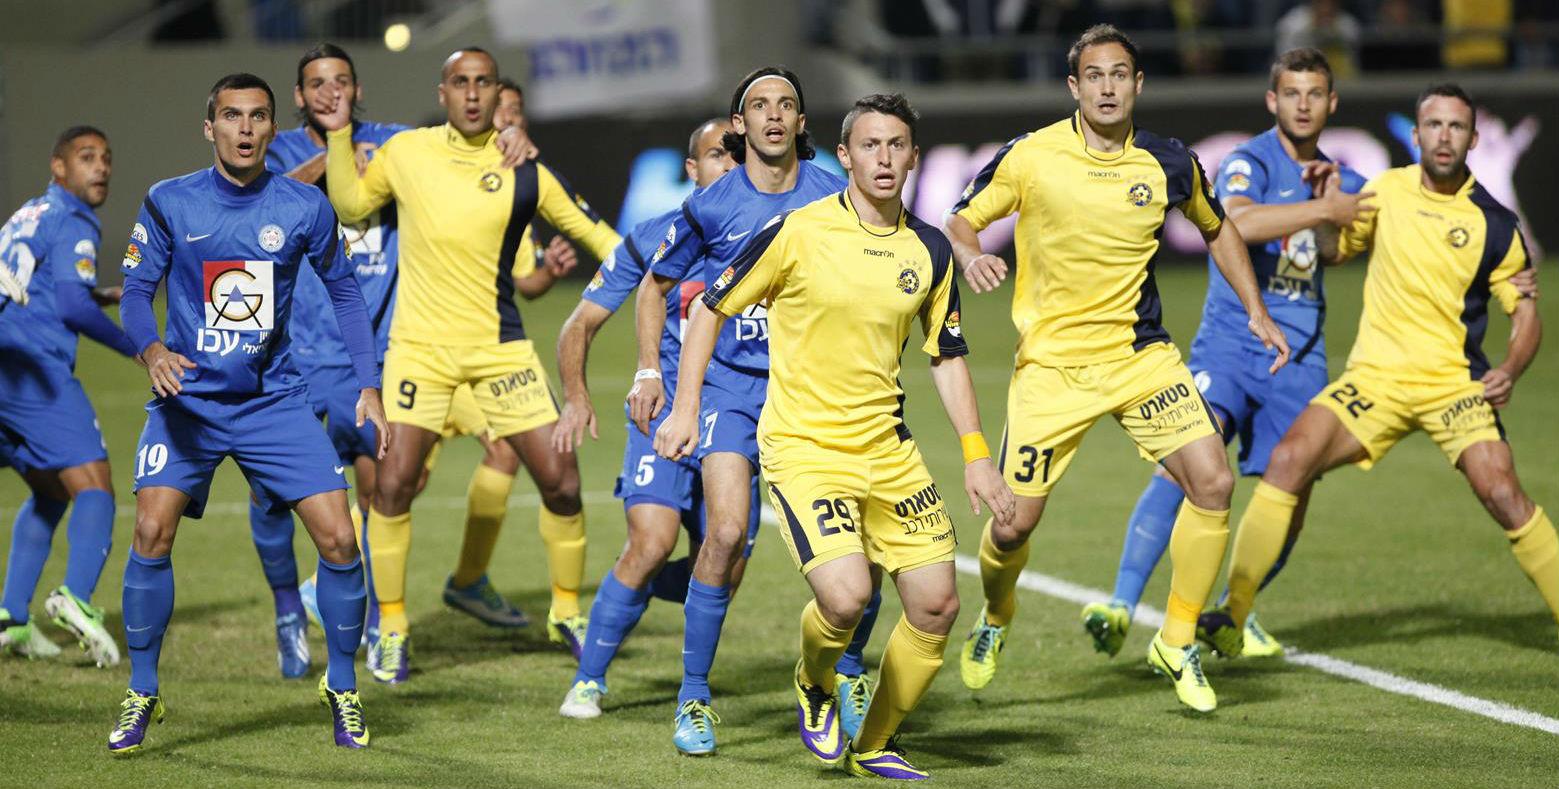 Courtesy Maccabi Tel Aviv Website